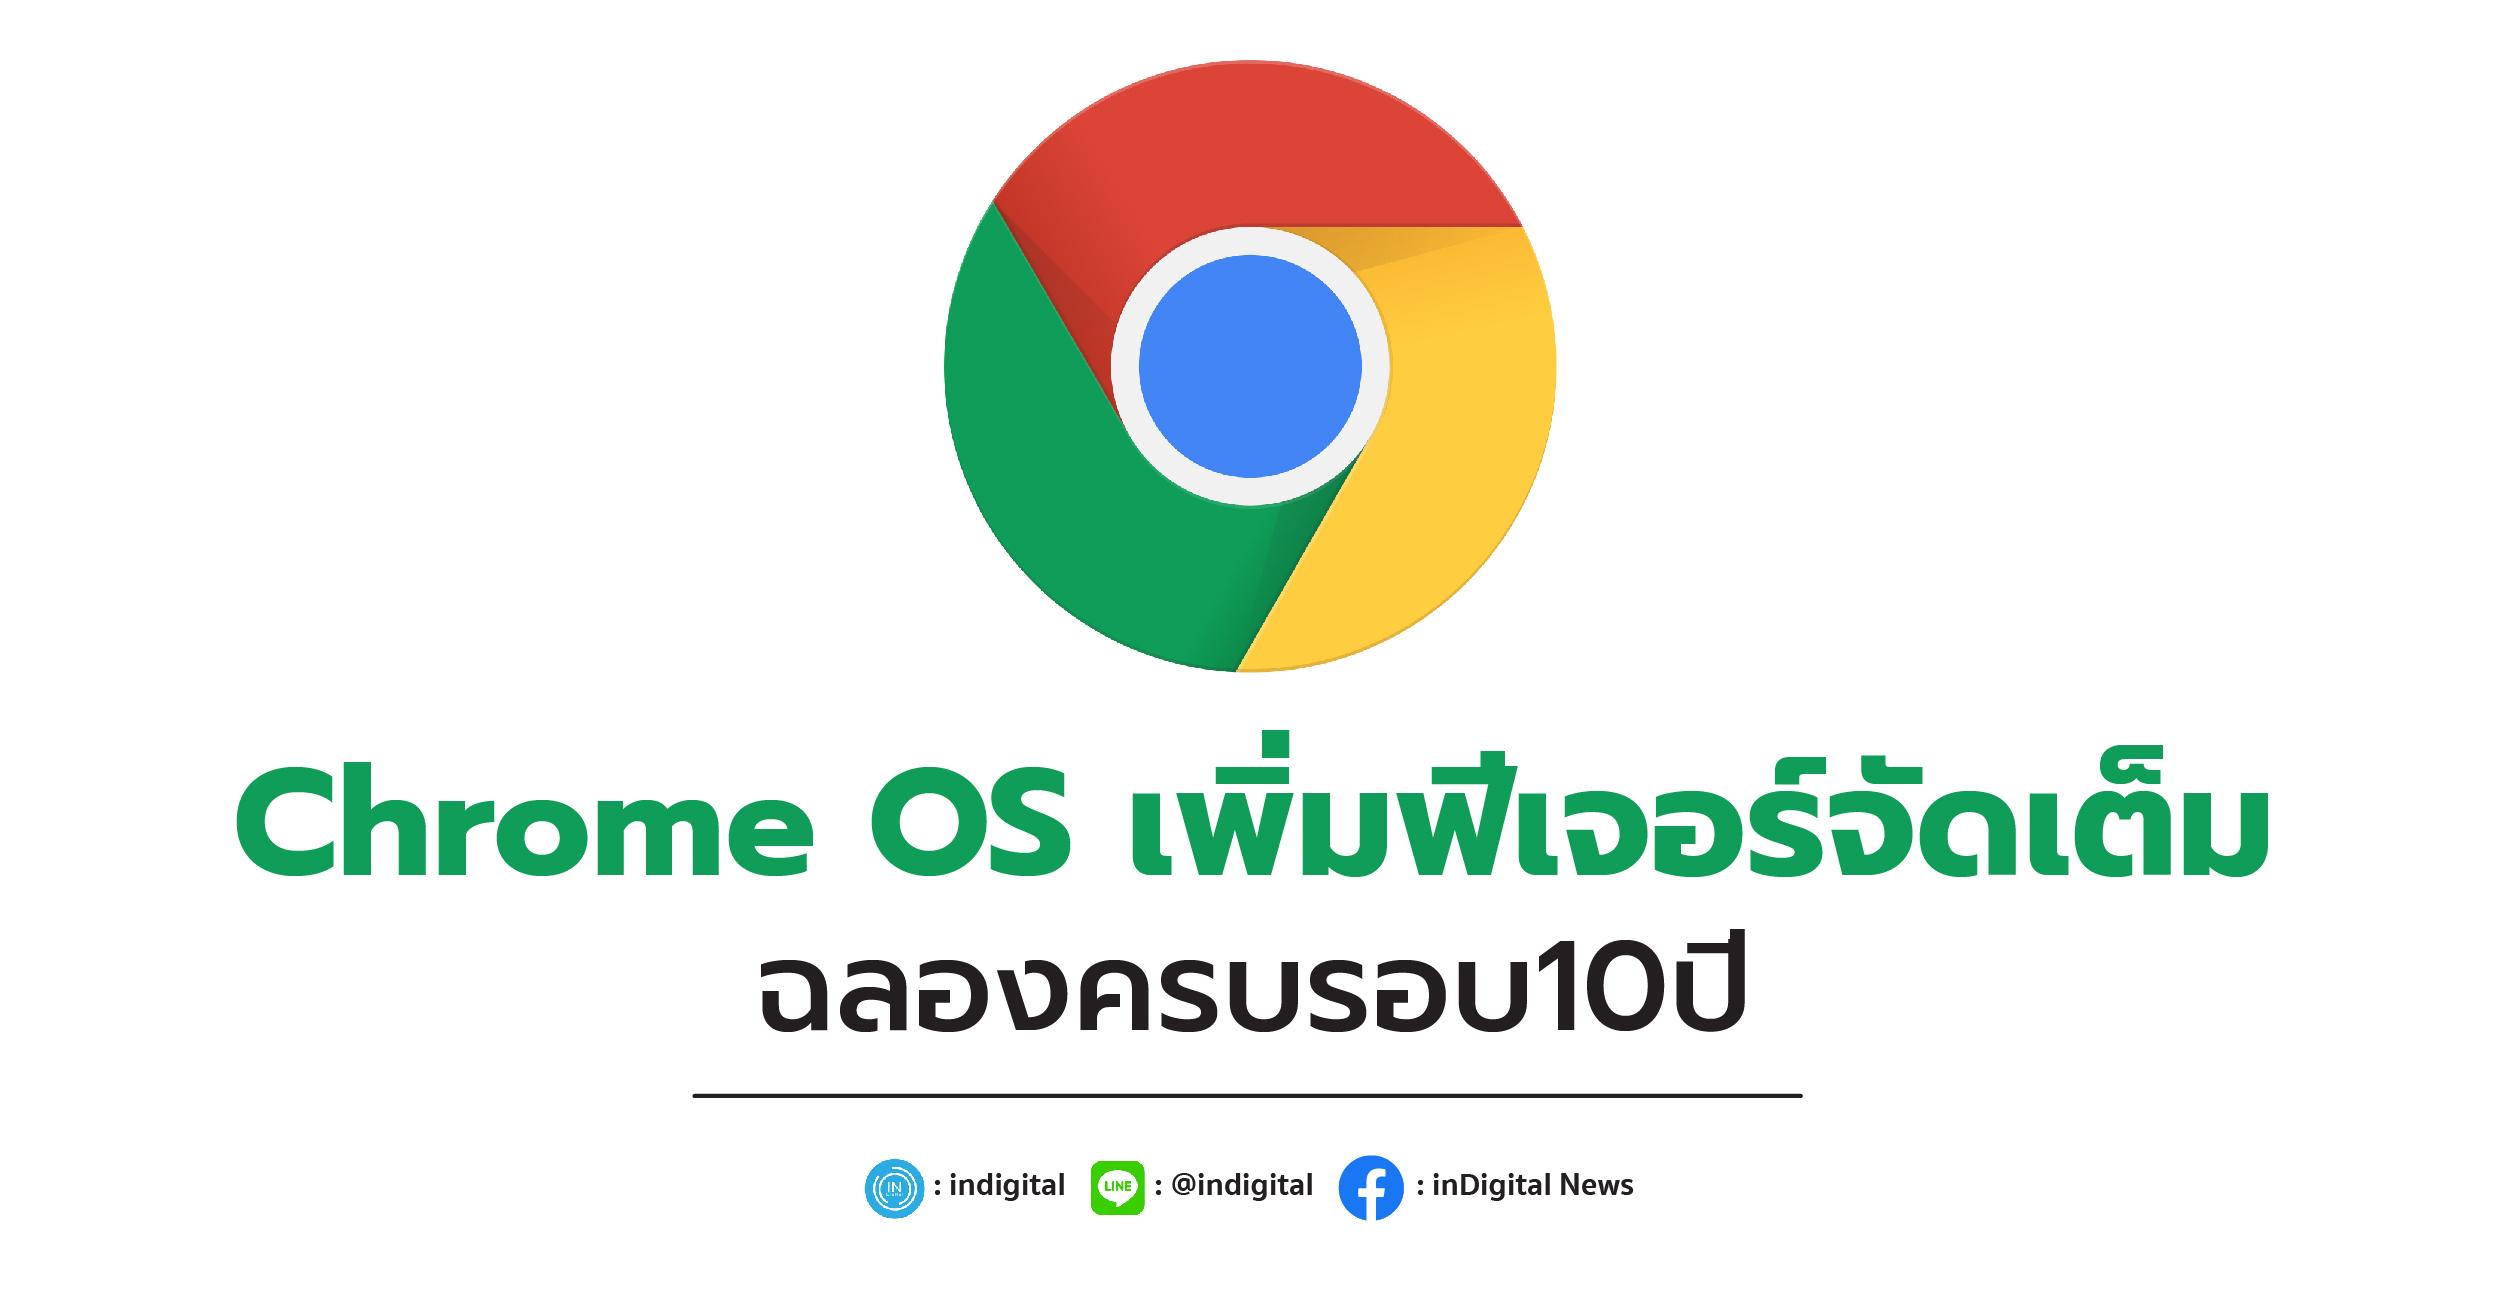 Chrome OS เพิ่มฟีเจอร์จัดเต็ม ฉลองครบรอบ10ปี